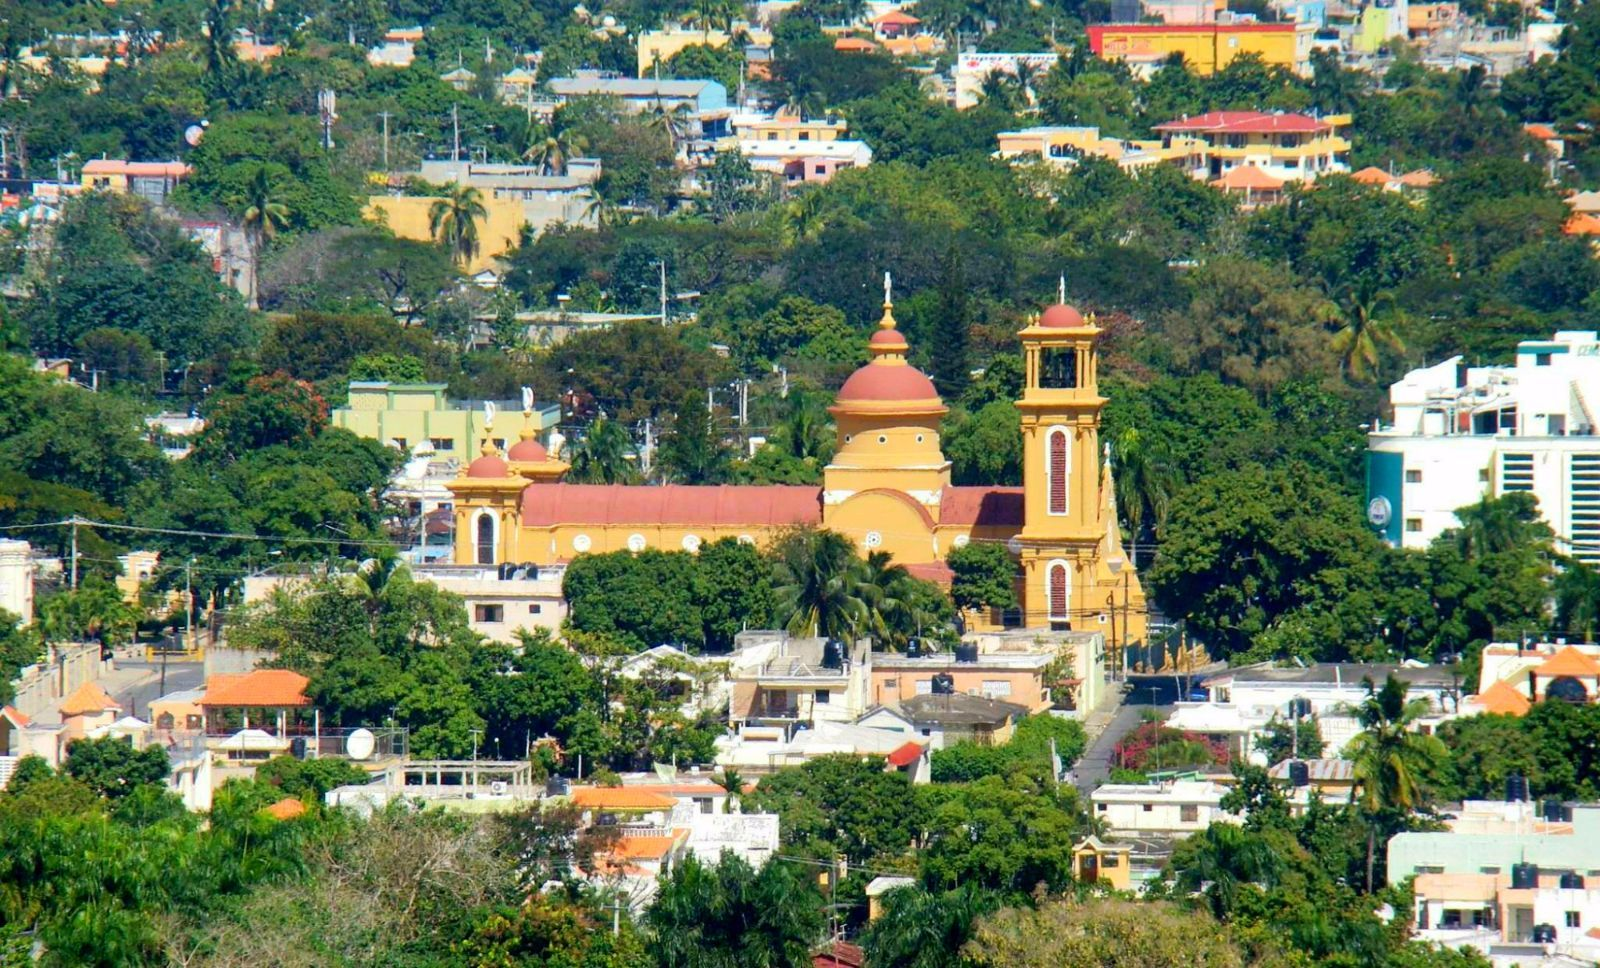 Whores in San Cristobal